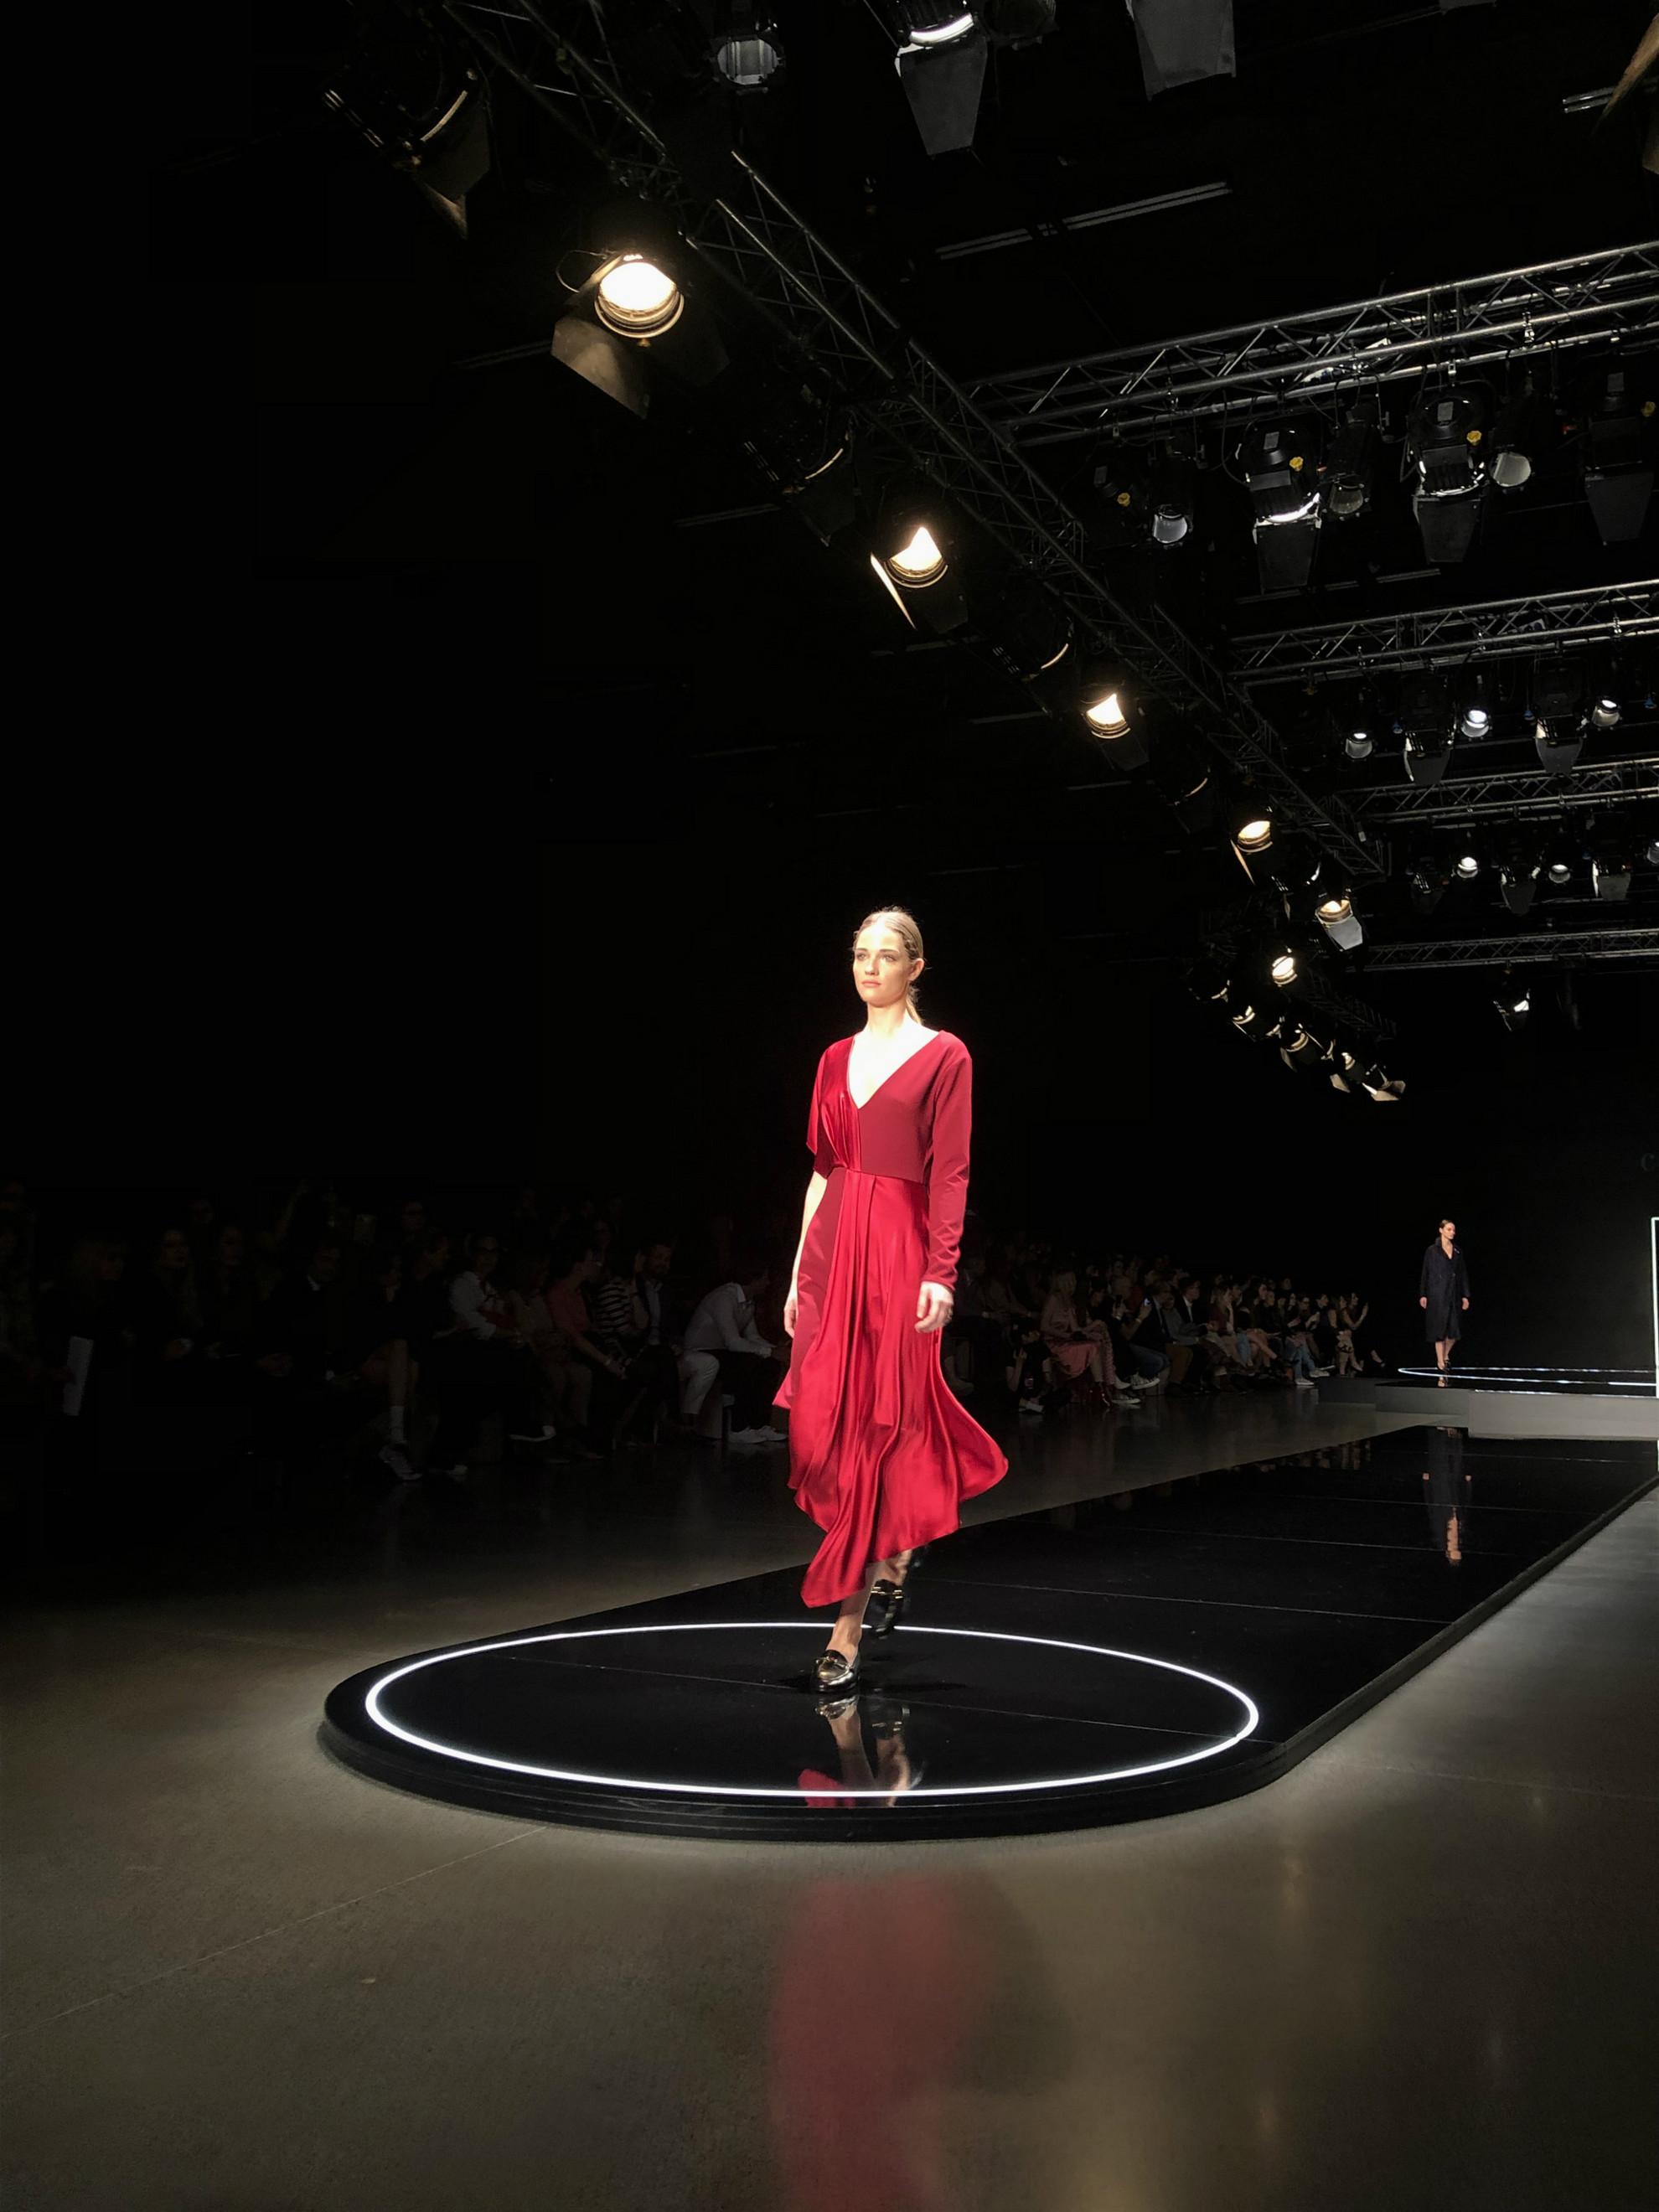 Modell a Celeni divatbemutatóján a 2019-es Budapest Central International Fashion Weeken